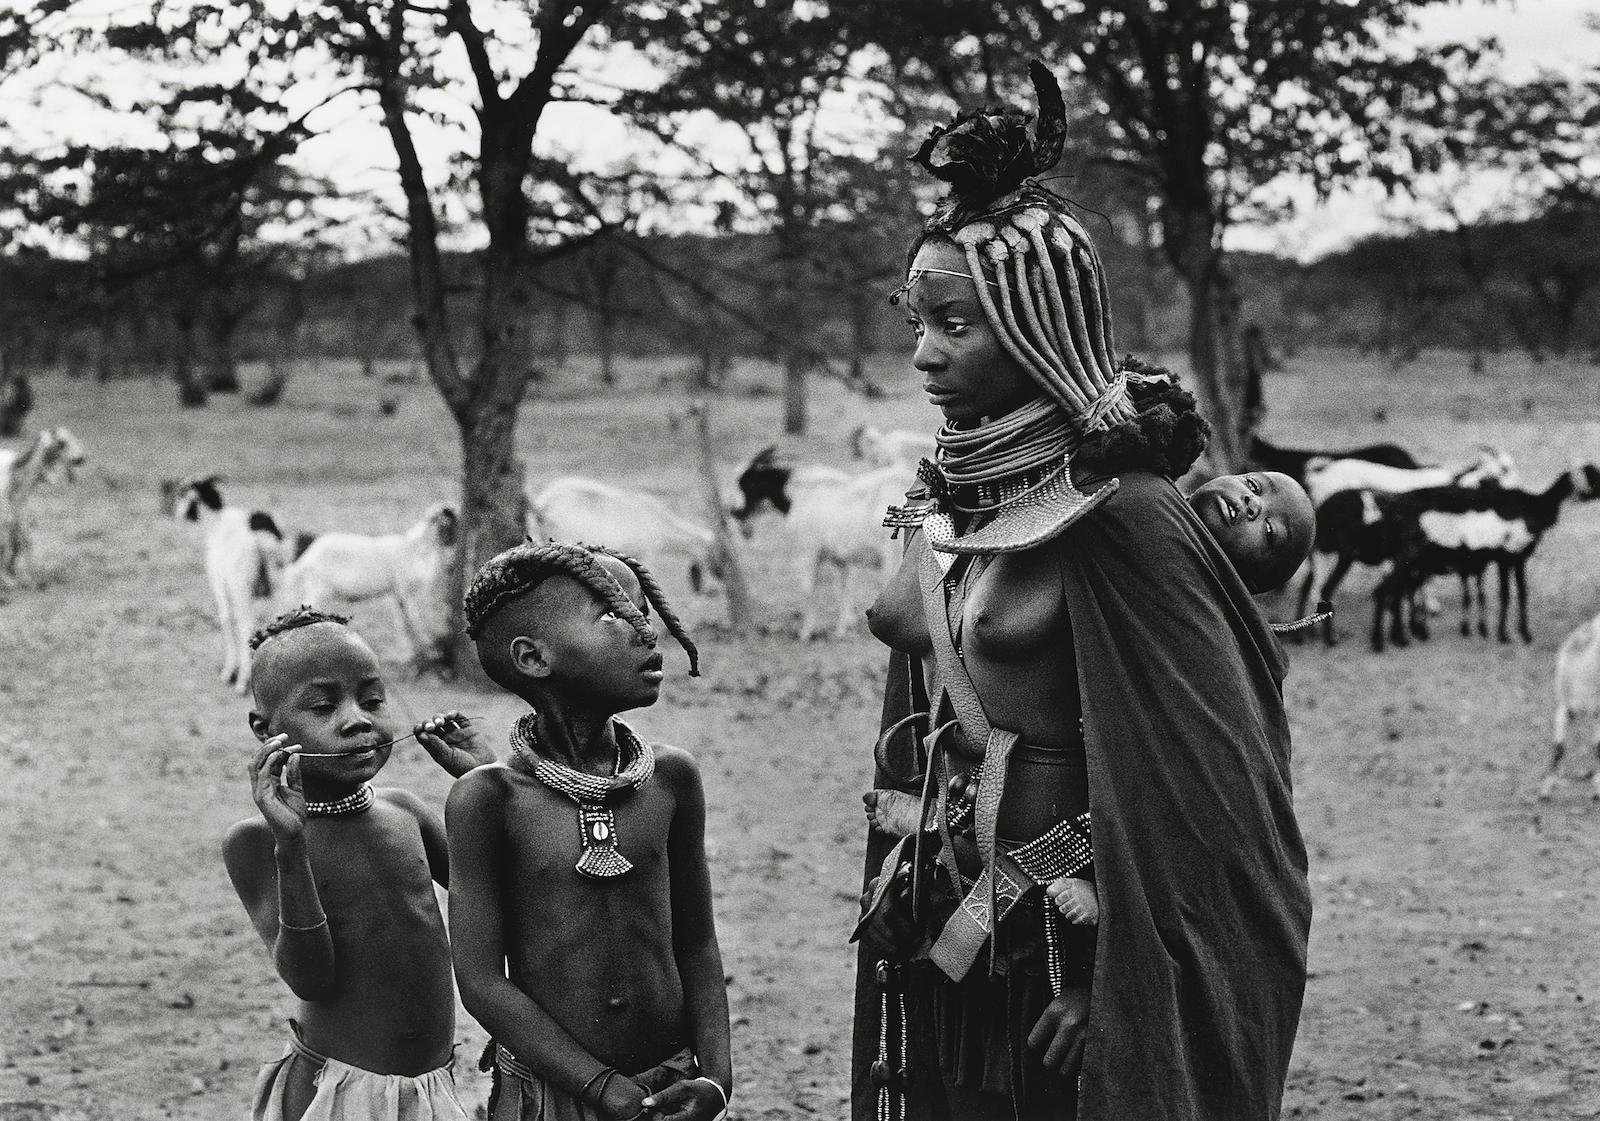 Sebastiao Salgado-A Himba group in Omuramba, near the Zebra mountains in Kaokoland, Namibia-2005